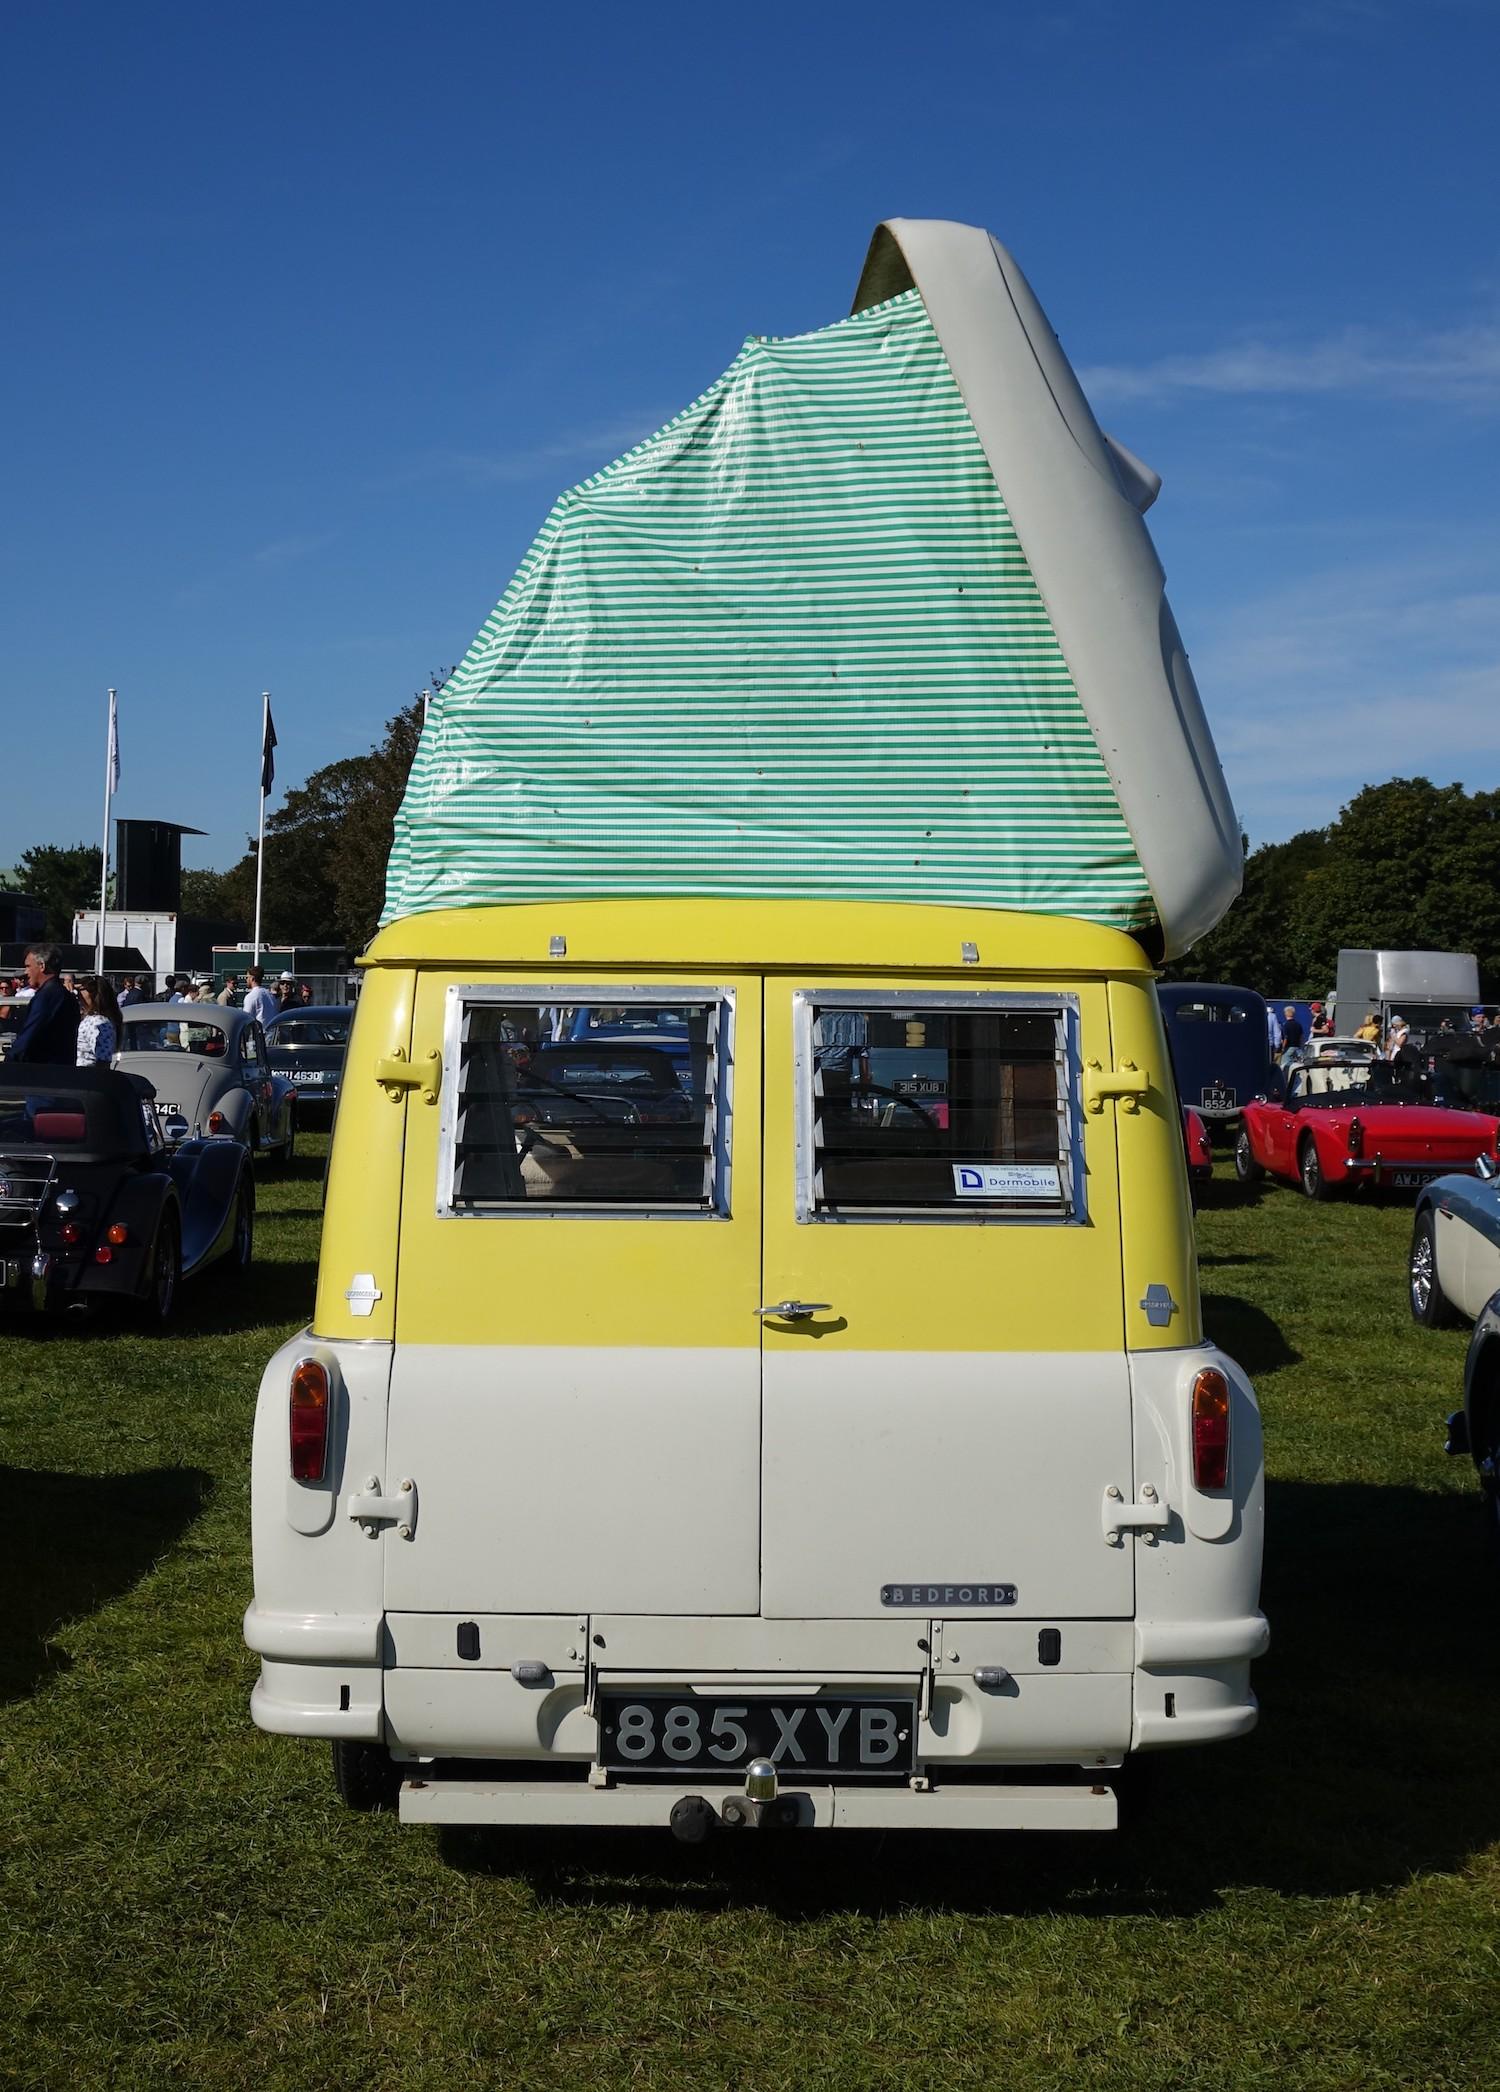 1964 Bedford CA Dormobile Deauville